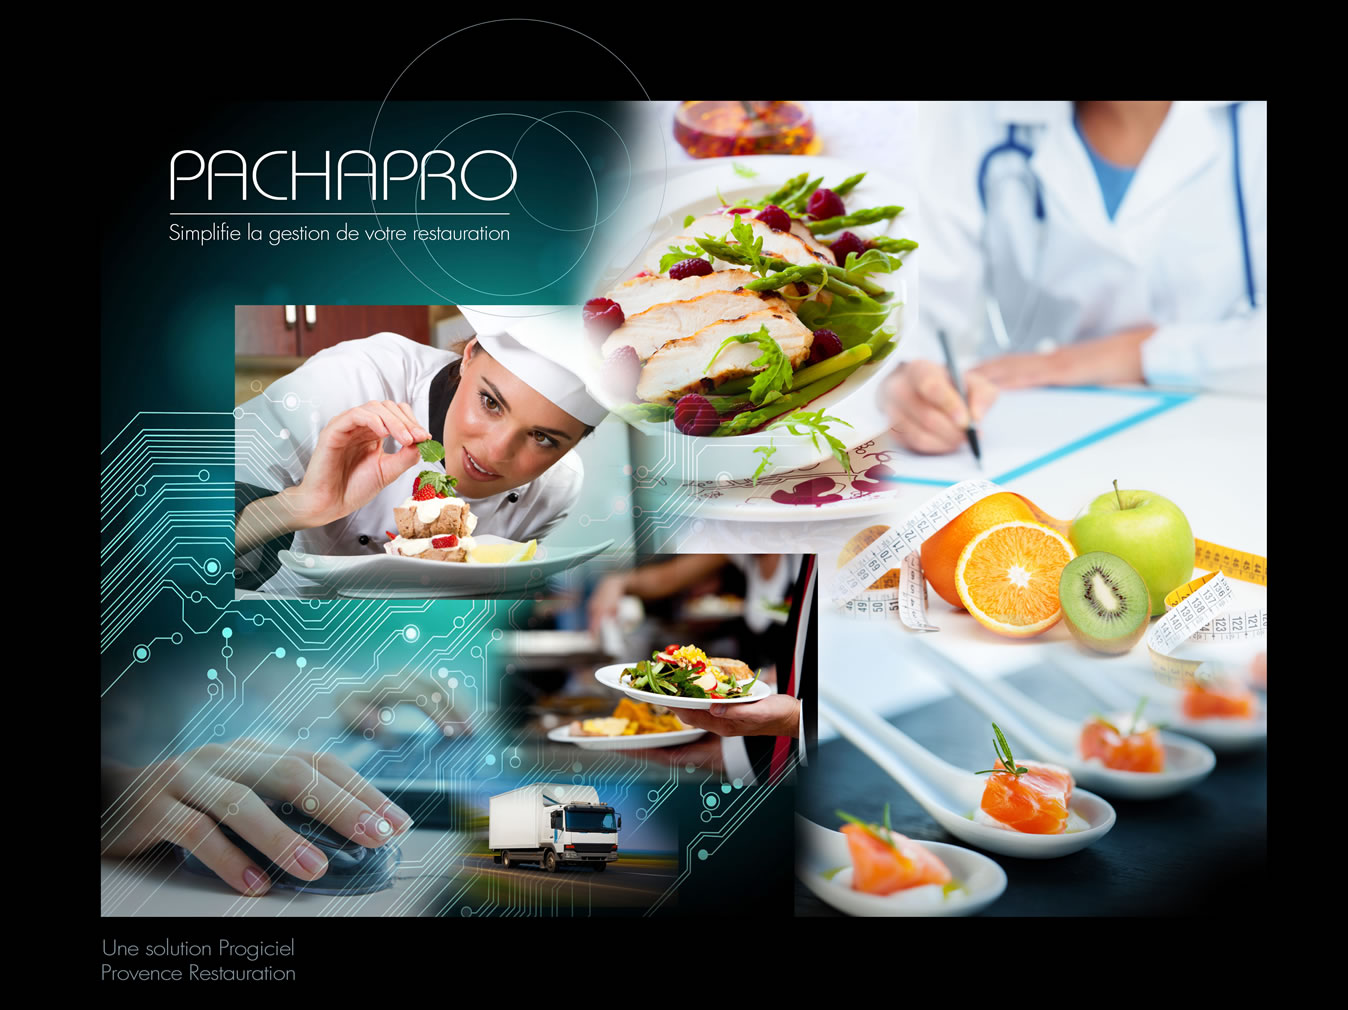 image pachapro5_r2_c2